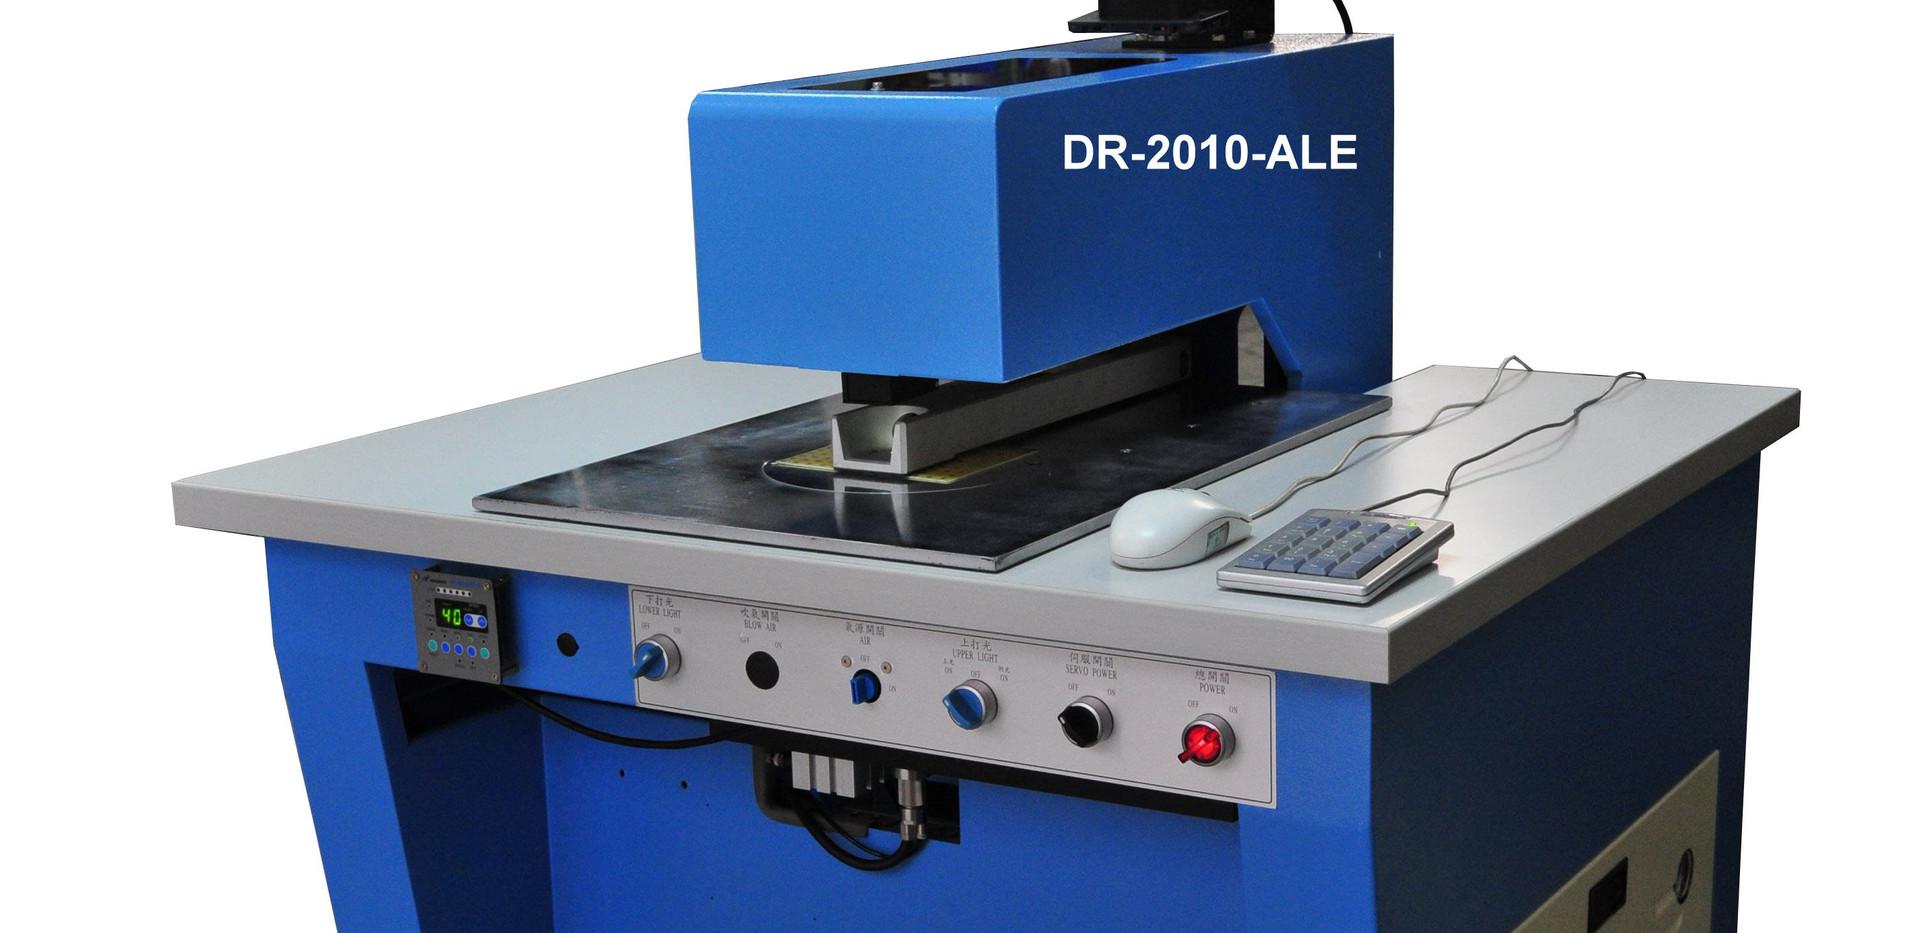 DR-2010-ALE.jpg